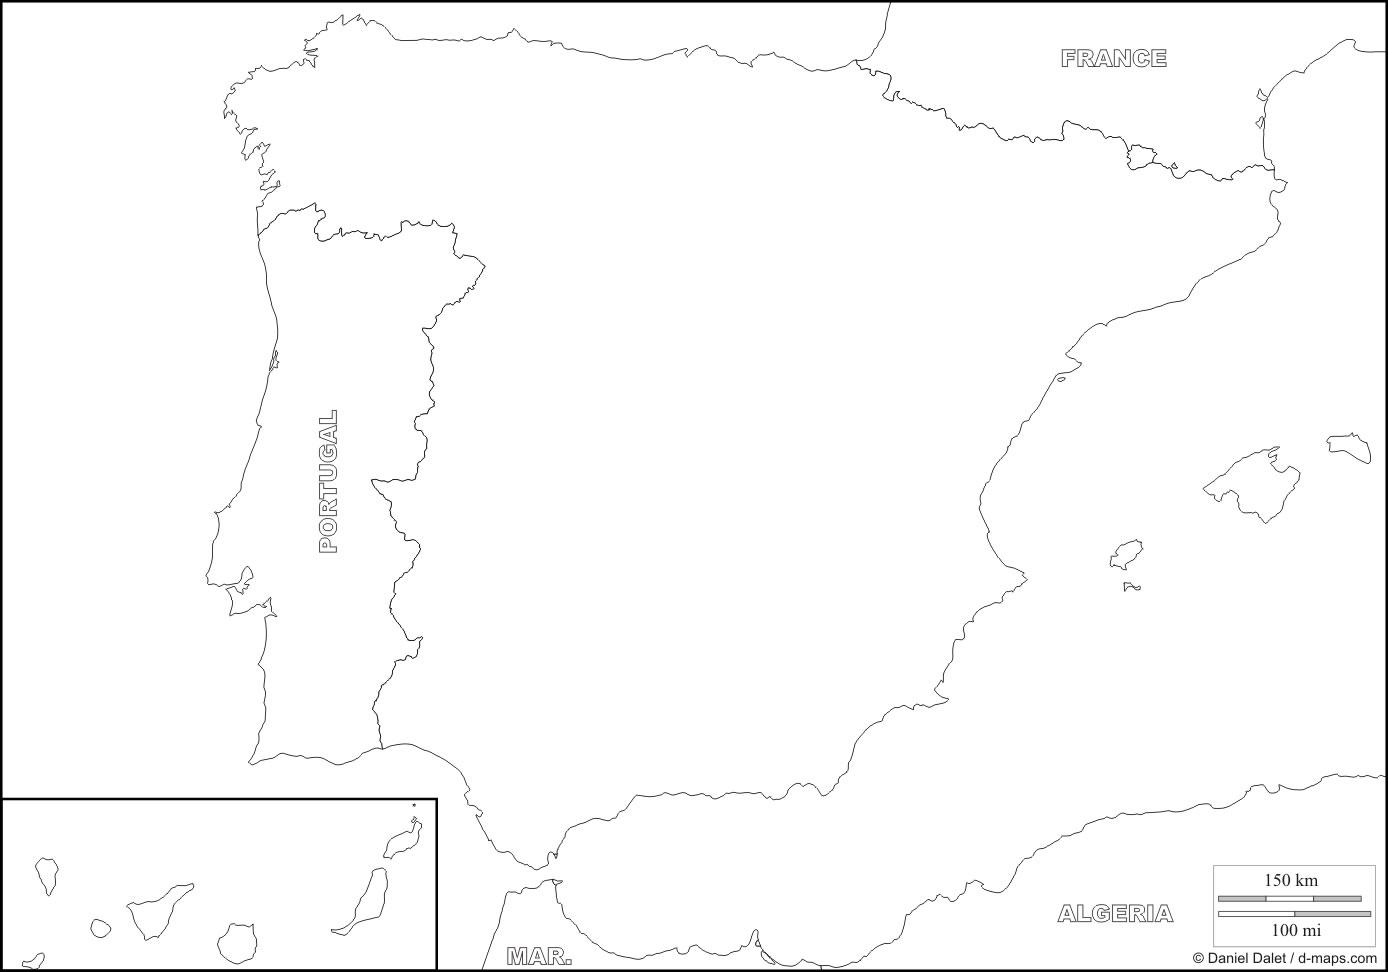 Carte Amerique Pays Vierge.Carte Espagne Vierge Carte Vierge De L Espagne